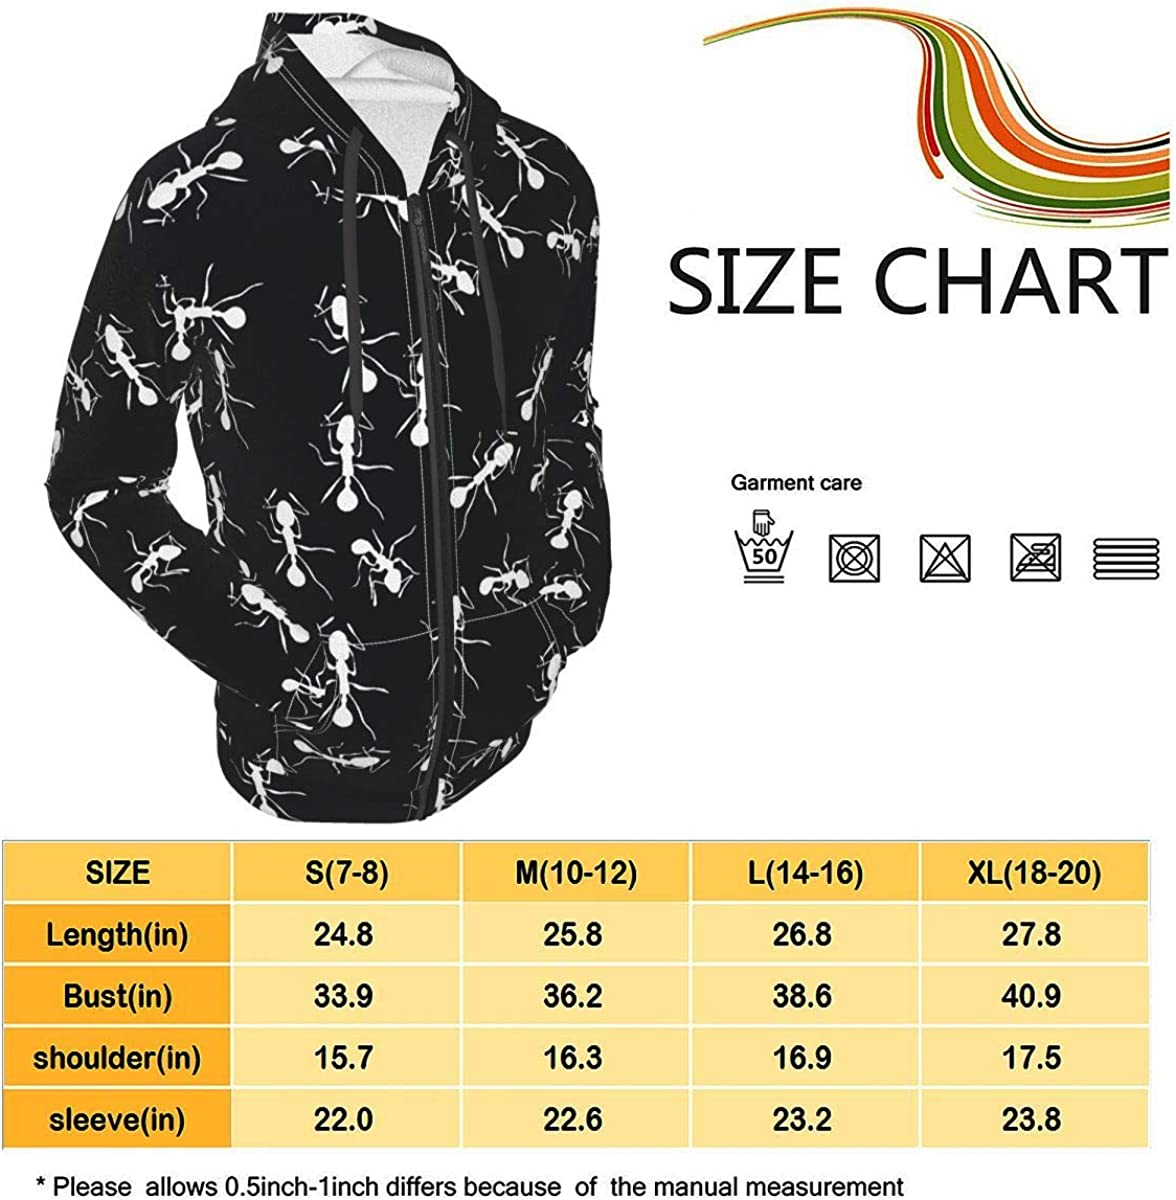 White Ants in Black Kids & Youth Full-Zip Fleece Hoodie Boys Graphic Hooded Sweatshirt Jacket Pockets